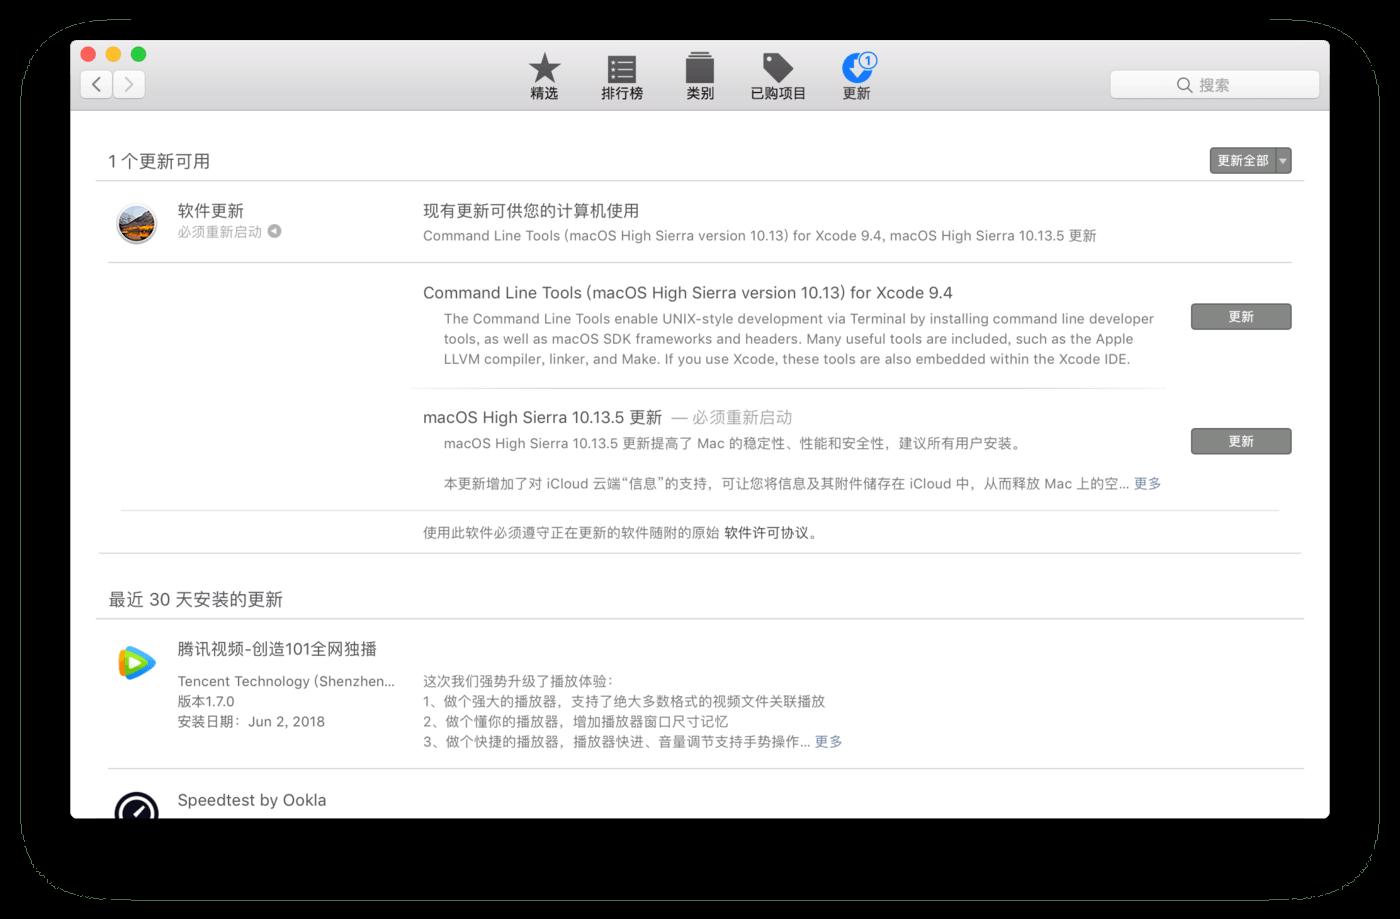 App Store 升级 macOS High Sierra 10.13.5